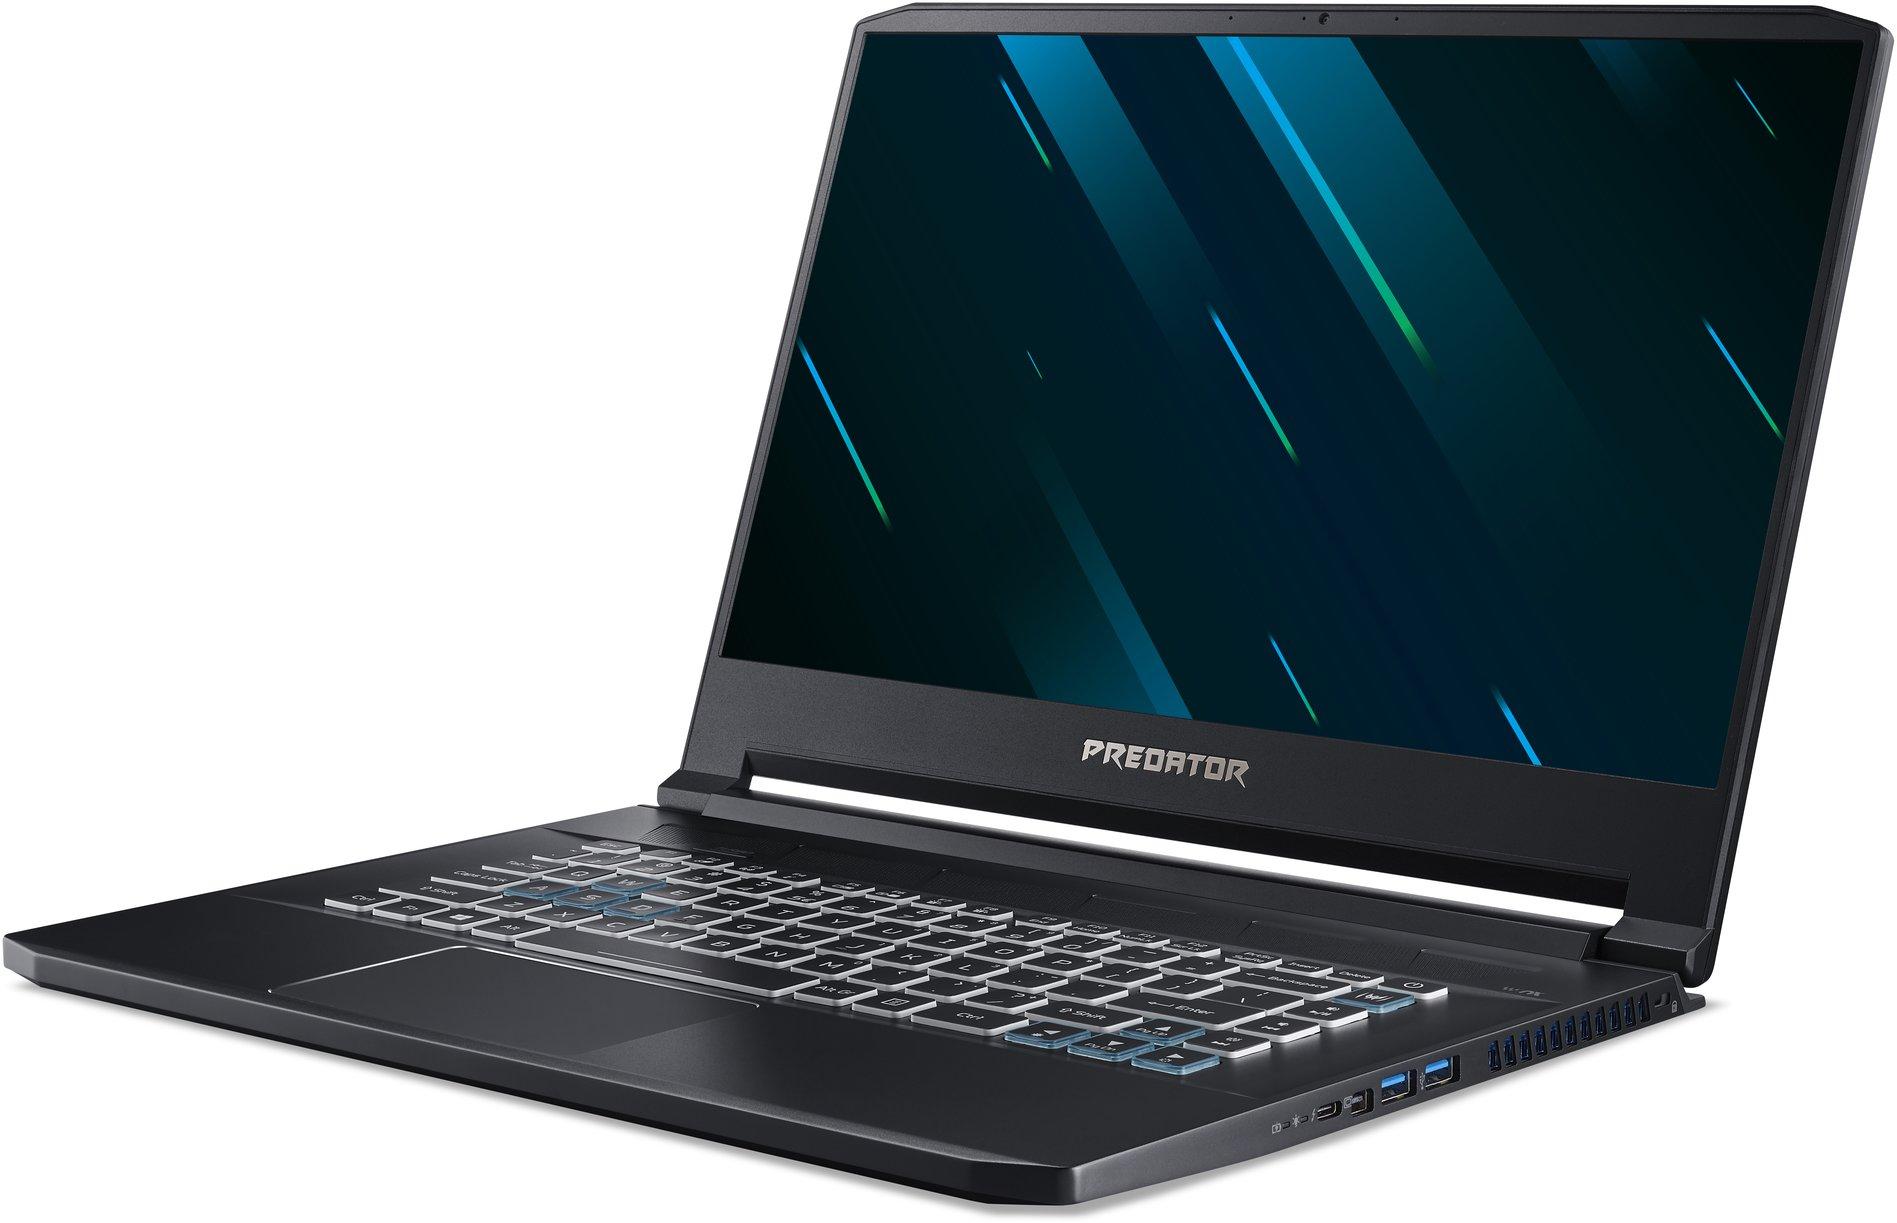 Acer Predator Triton 500 PT515-51-75ZN